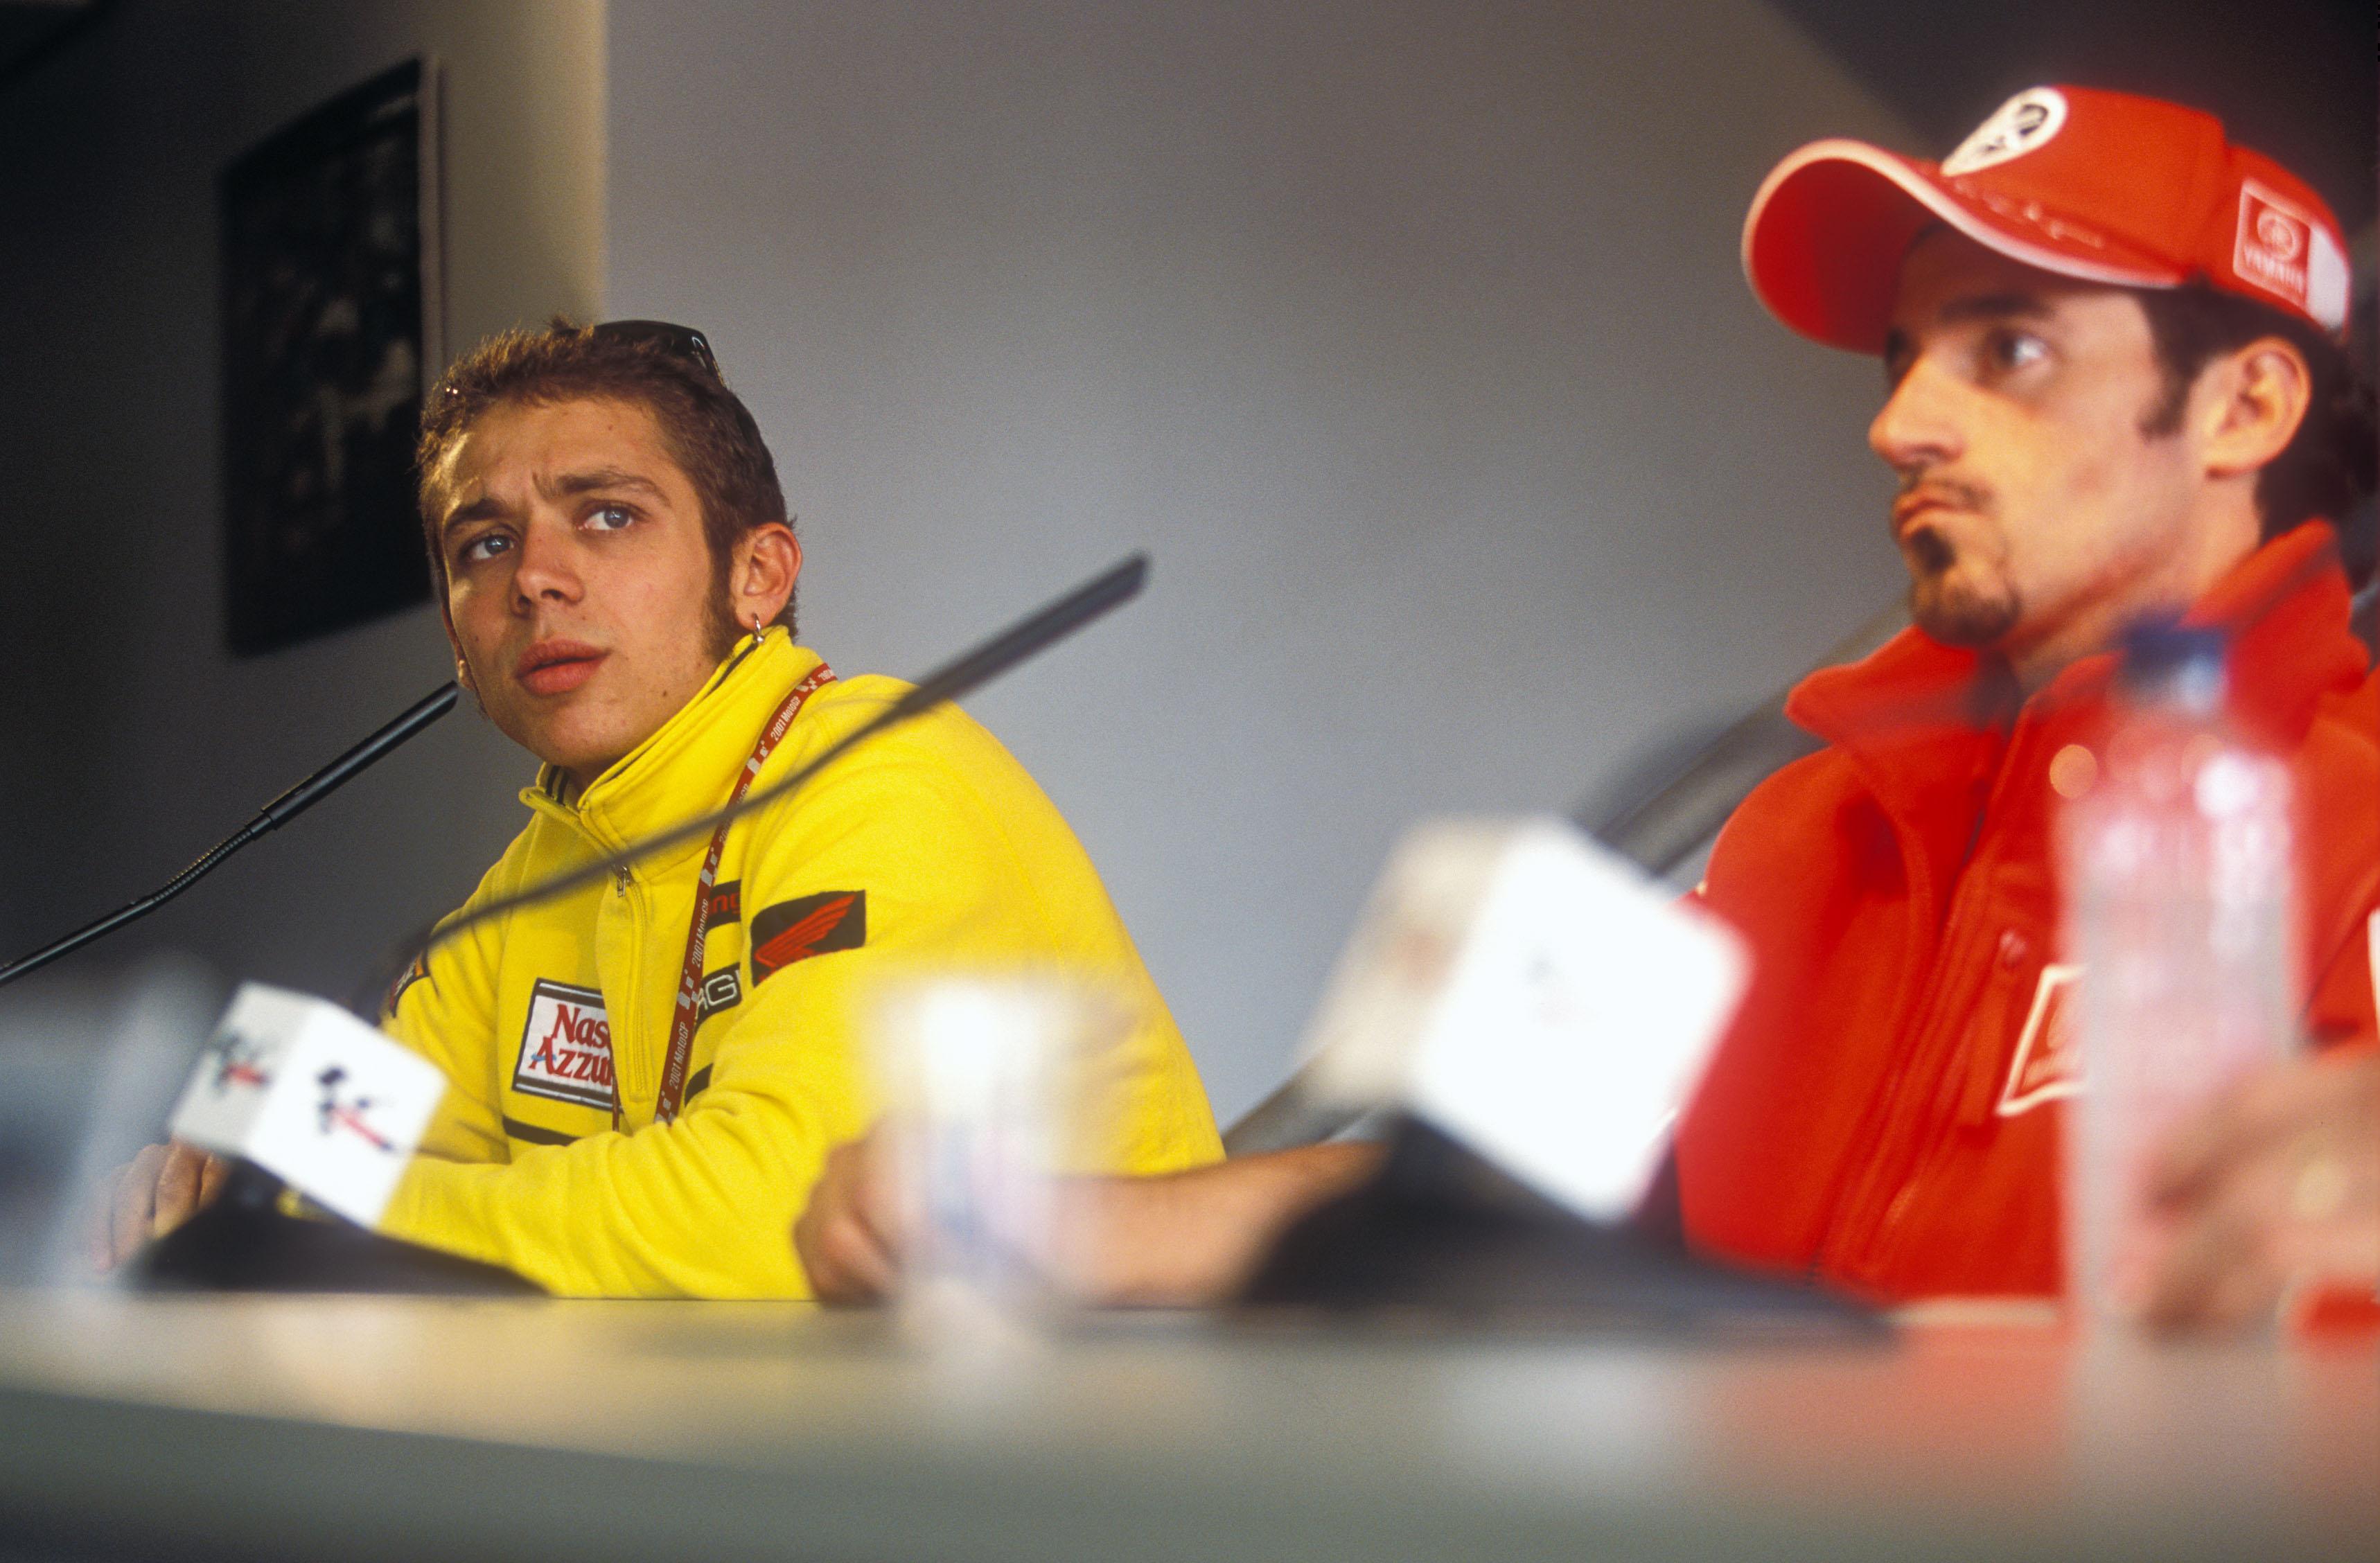 Biaggi: Rossi has no chance | Visordown